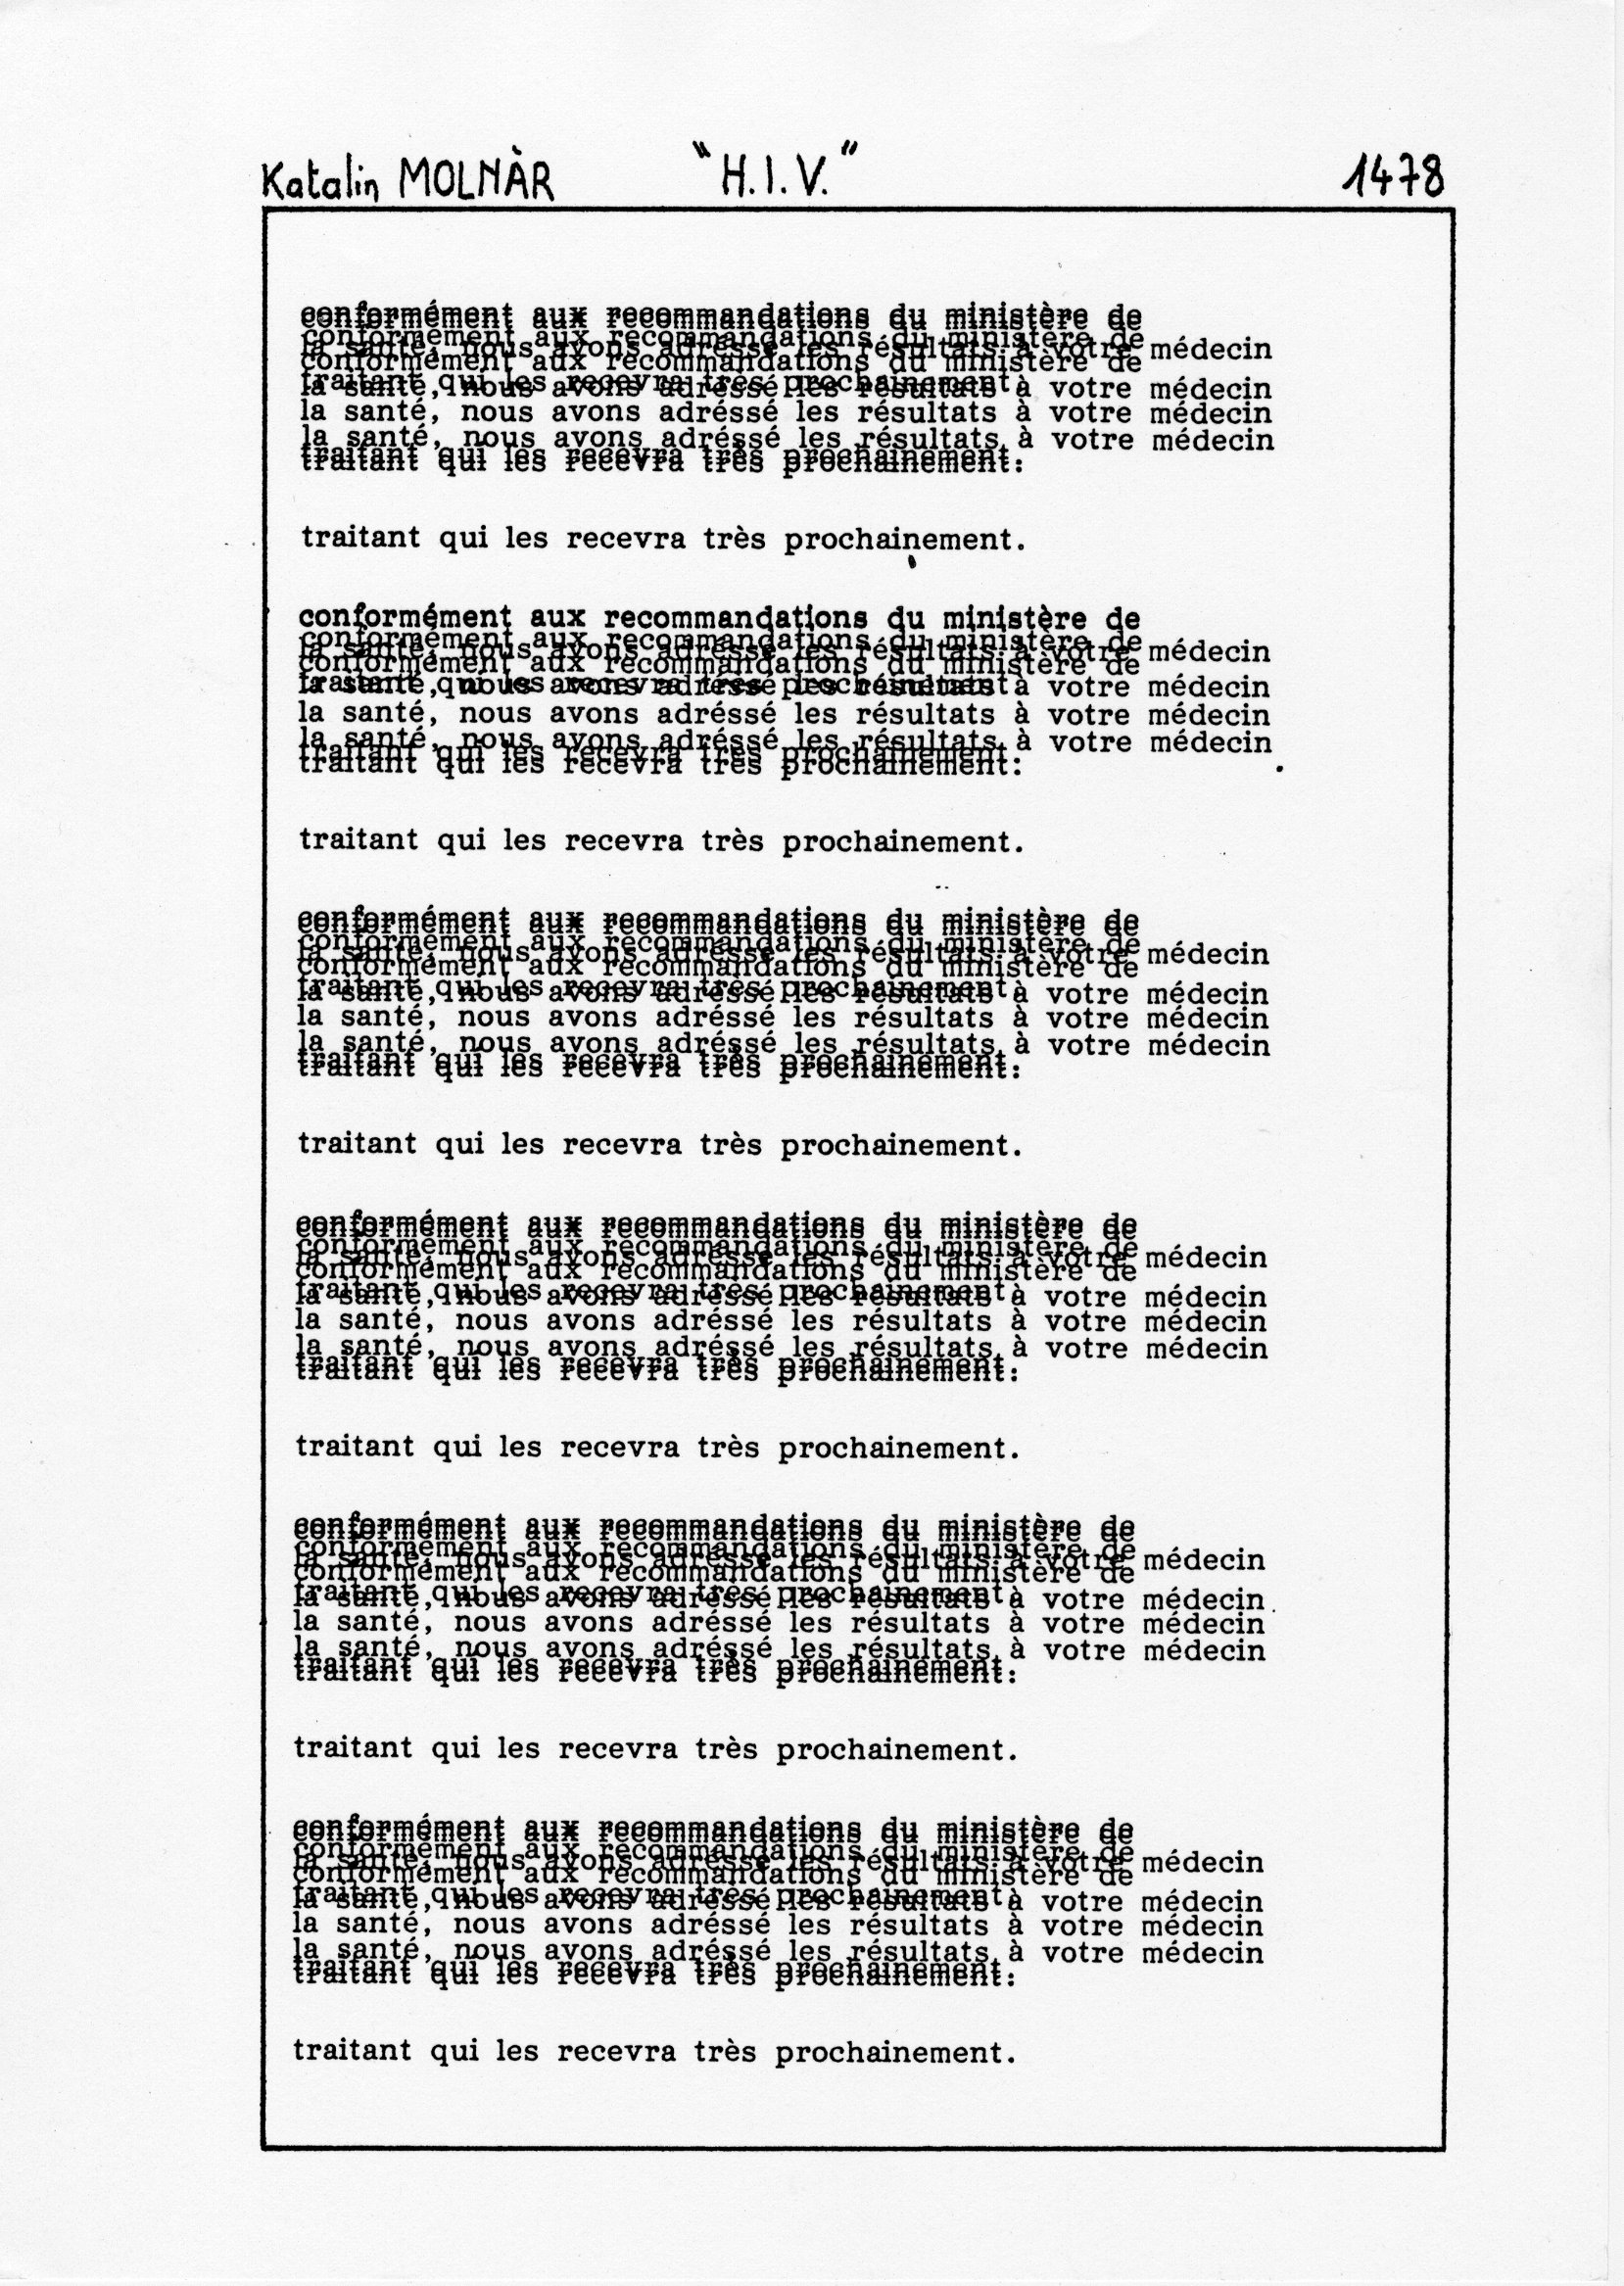 page 1478 K. Molnar H.I.V.